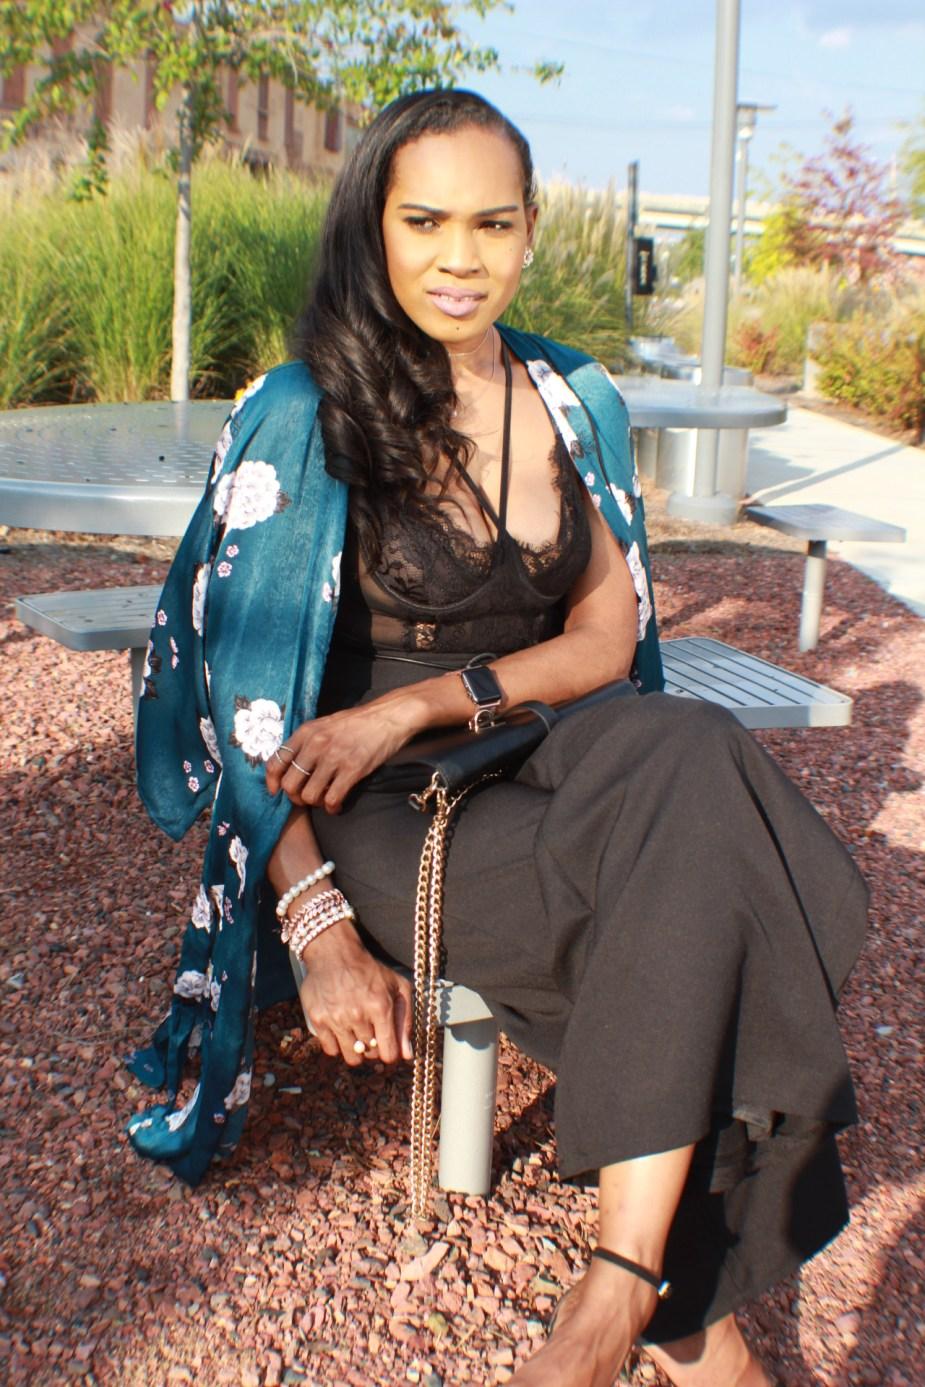 Style-files-Monteau-Green-floral-kimono-Boohoo-Wideleg-pants-zara-pvc-clear-black-pumps-forever21-lace-corset-bodysuit-ooohlalablog-14